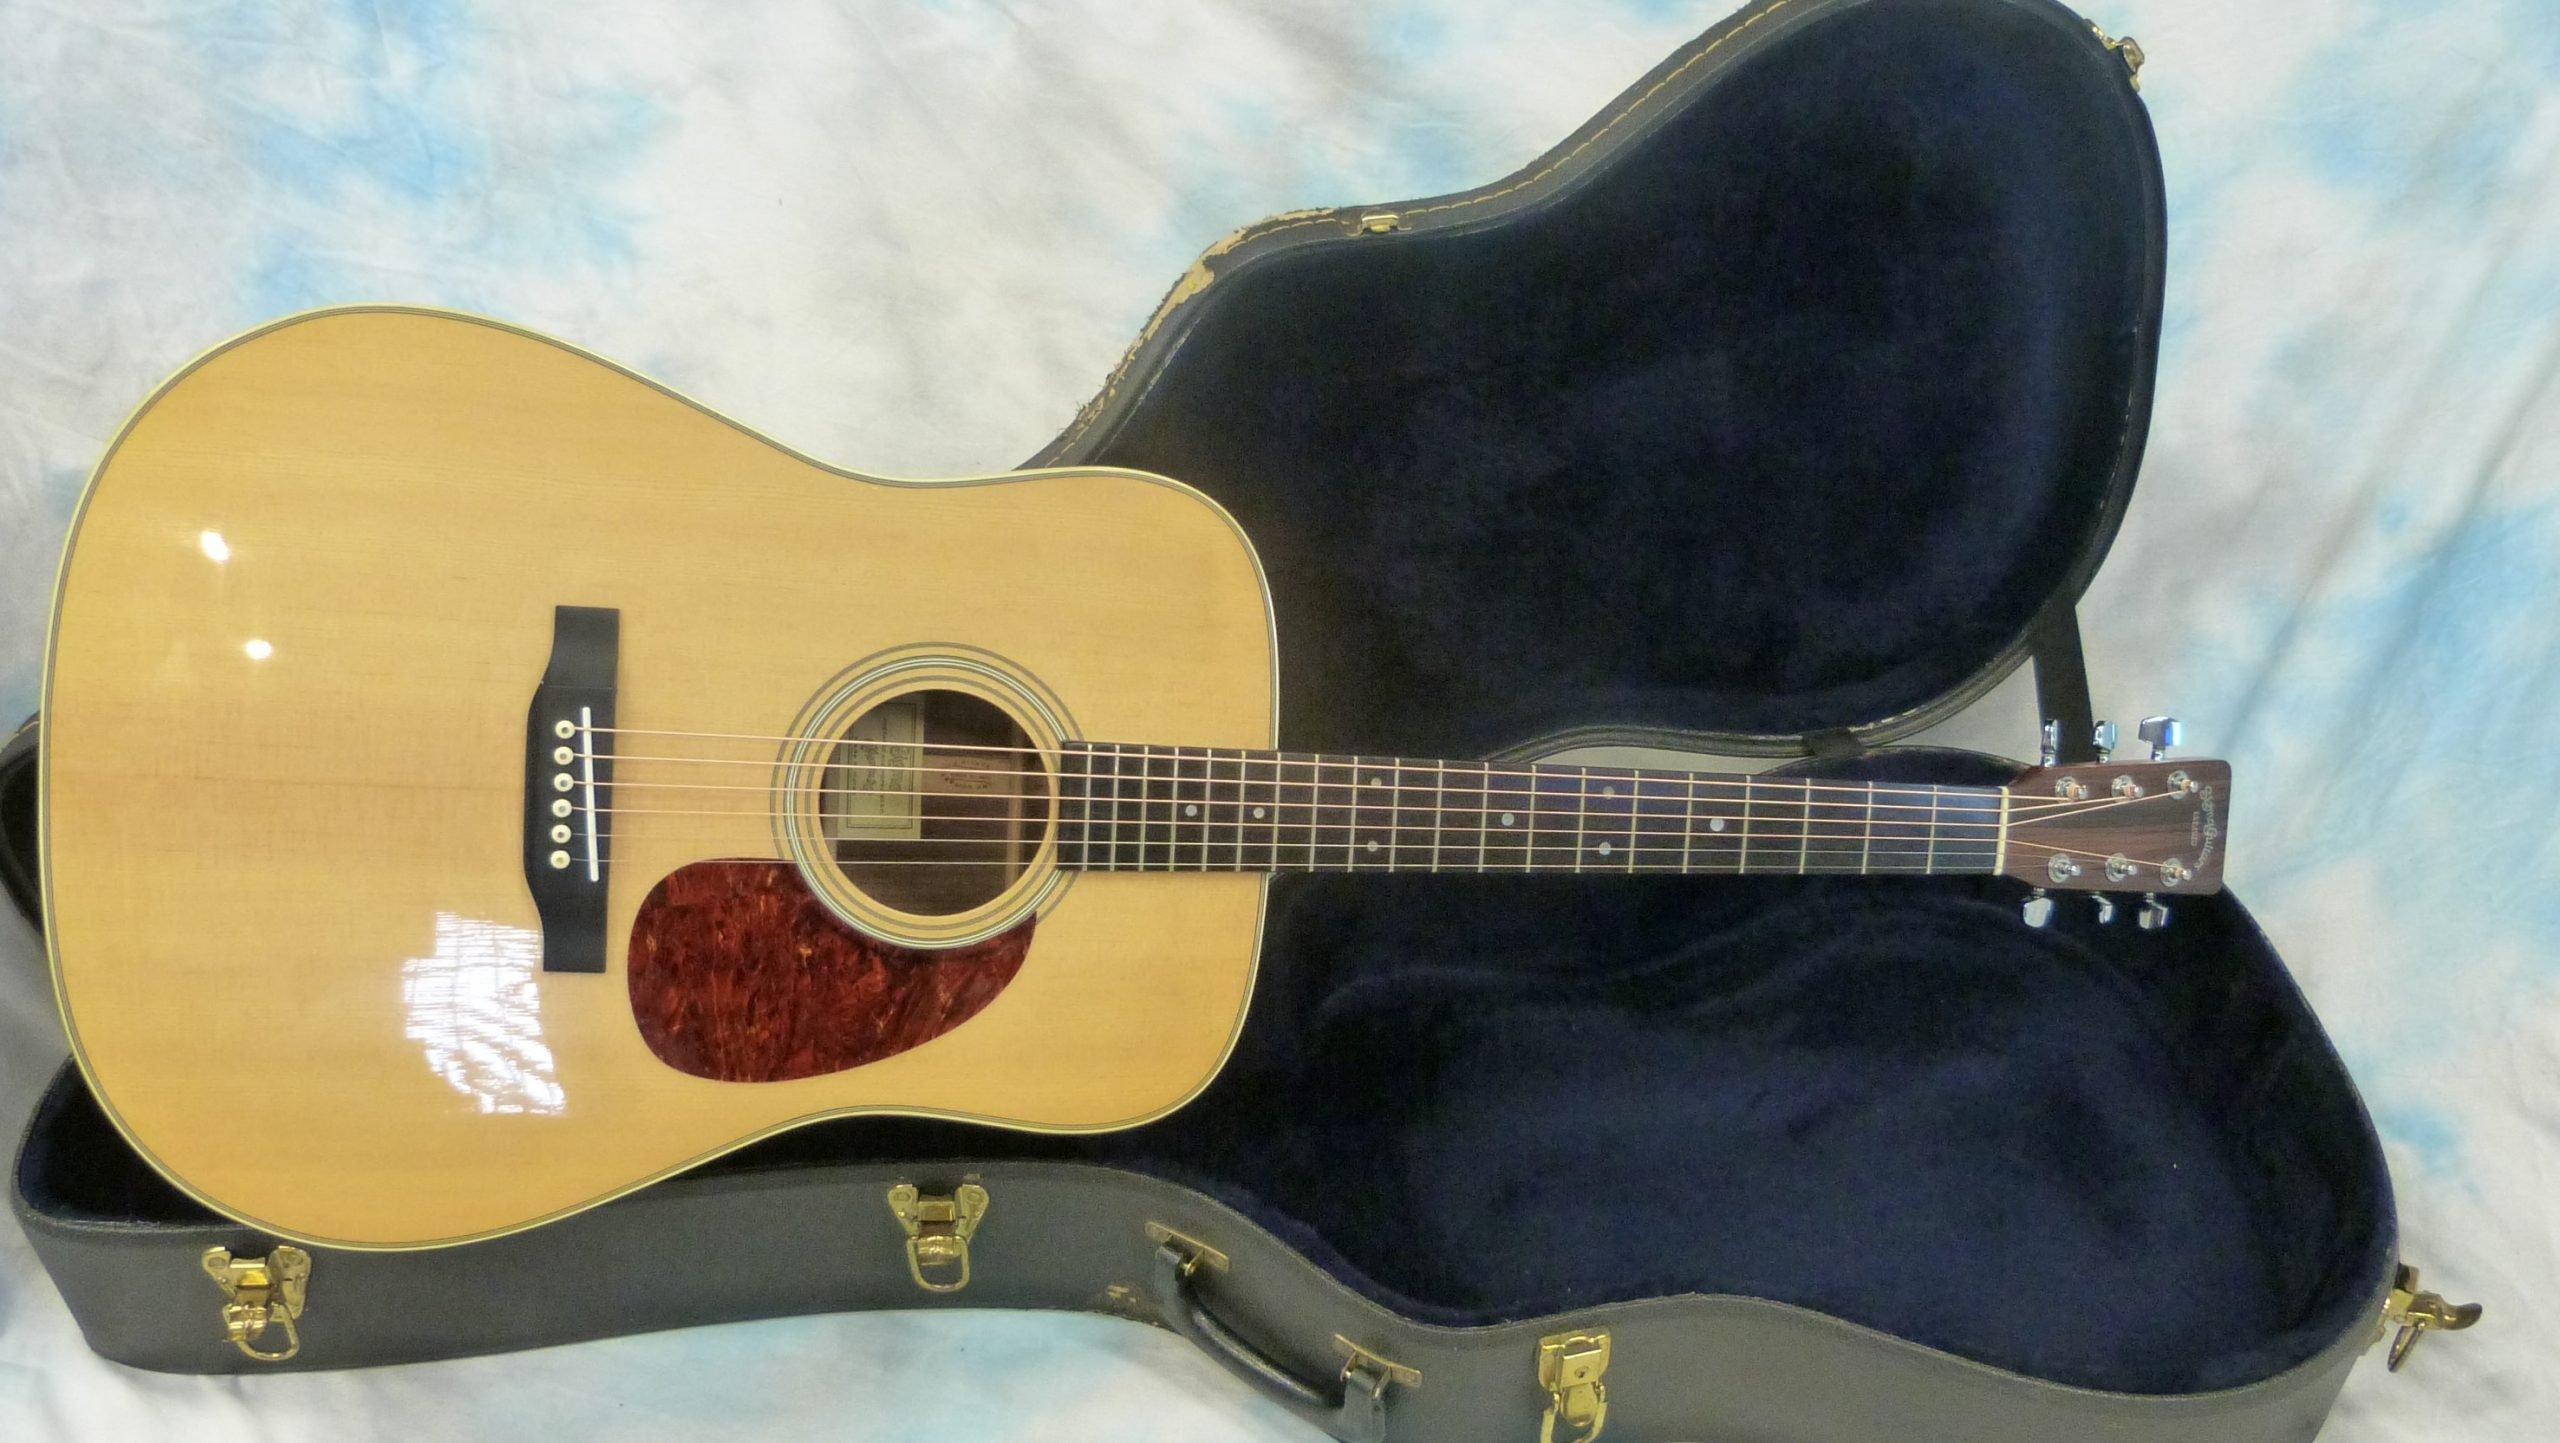 Sigma Sdr 28 1980 S Korean Inc Hard Case Austin Guitars